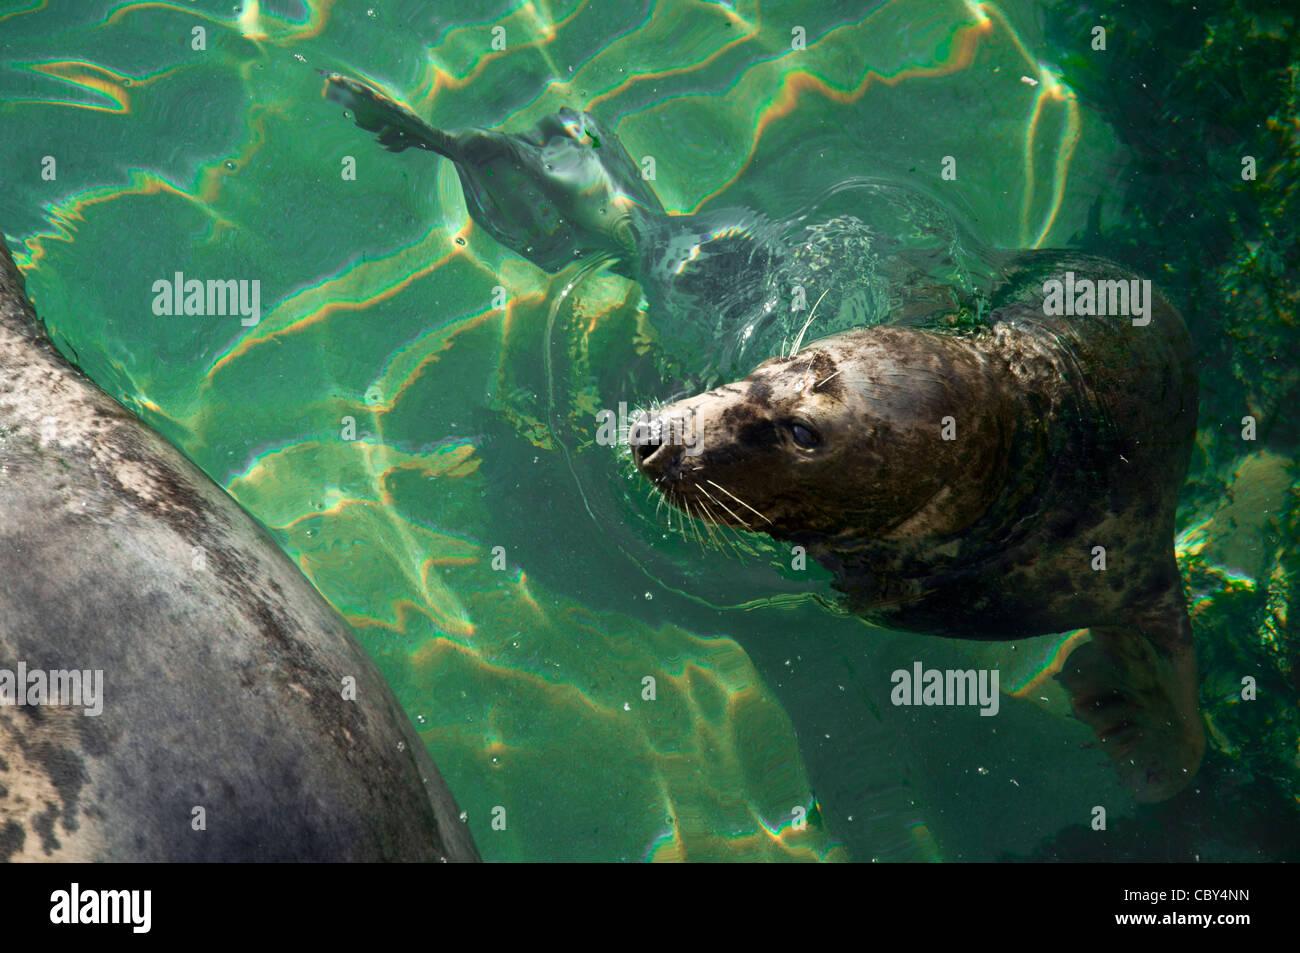 South American sea lion, Otaria flavescens, Otaridae, Carnivora - Stock Image